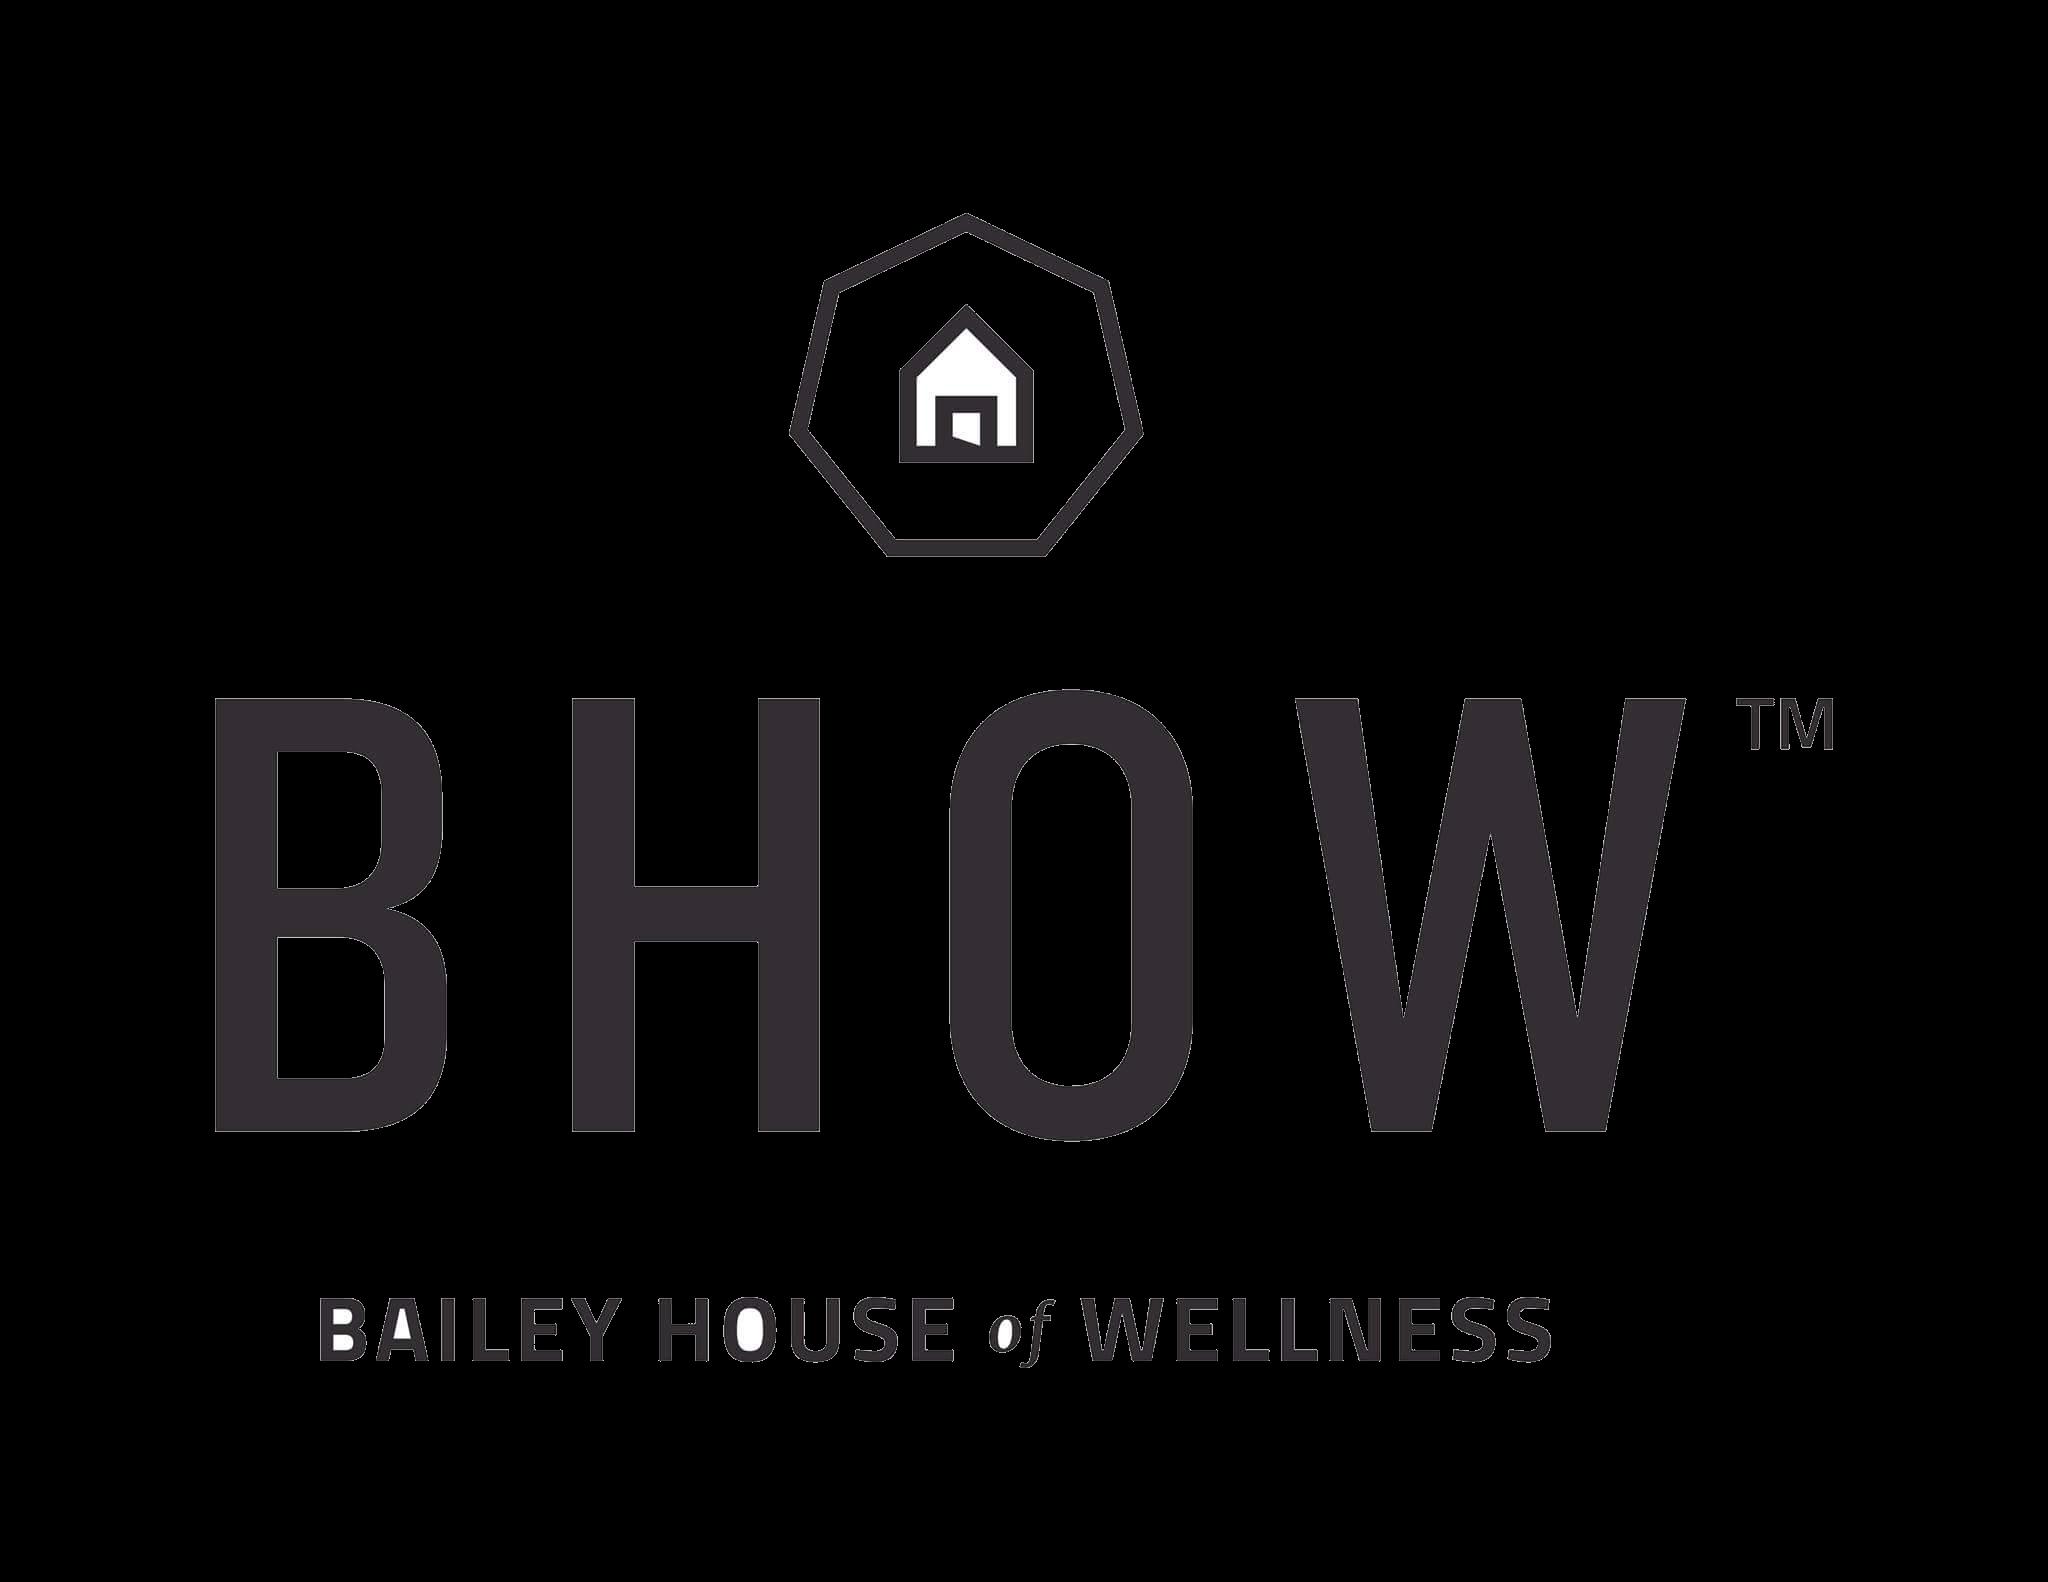 Bailey House of Wellness logo